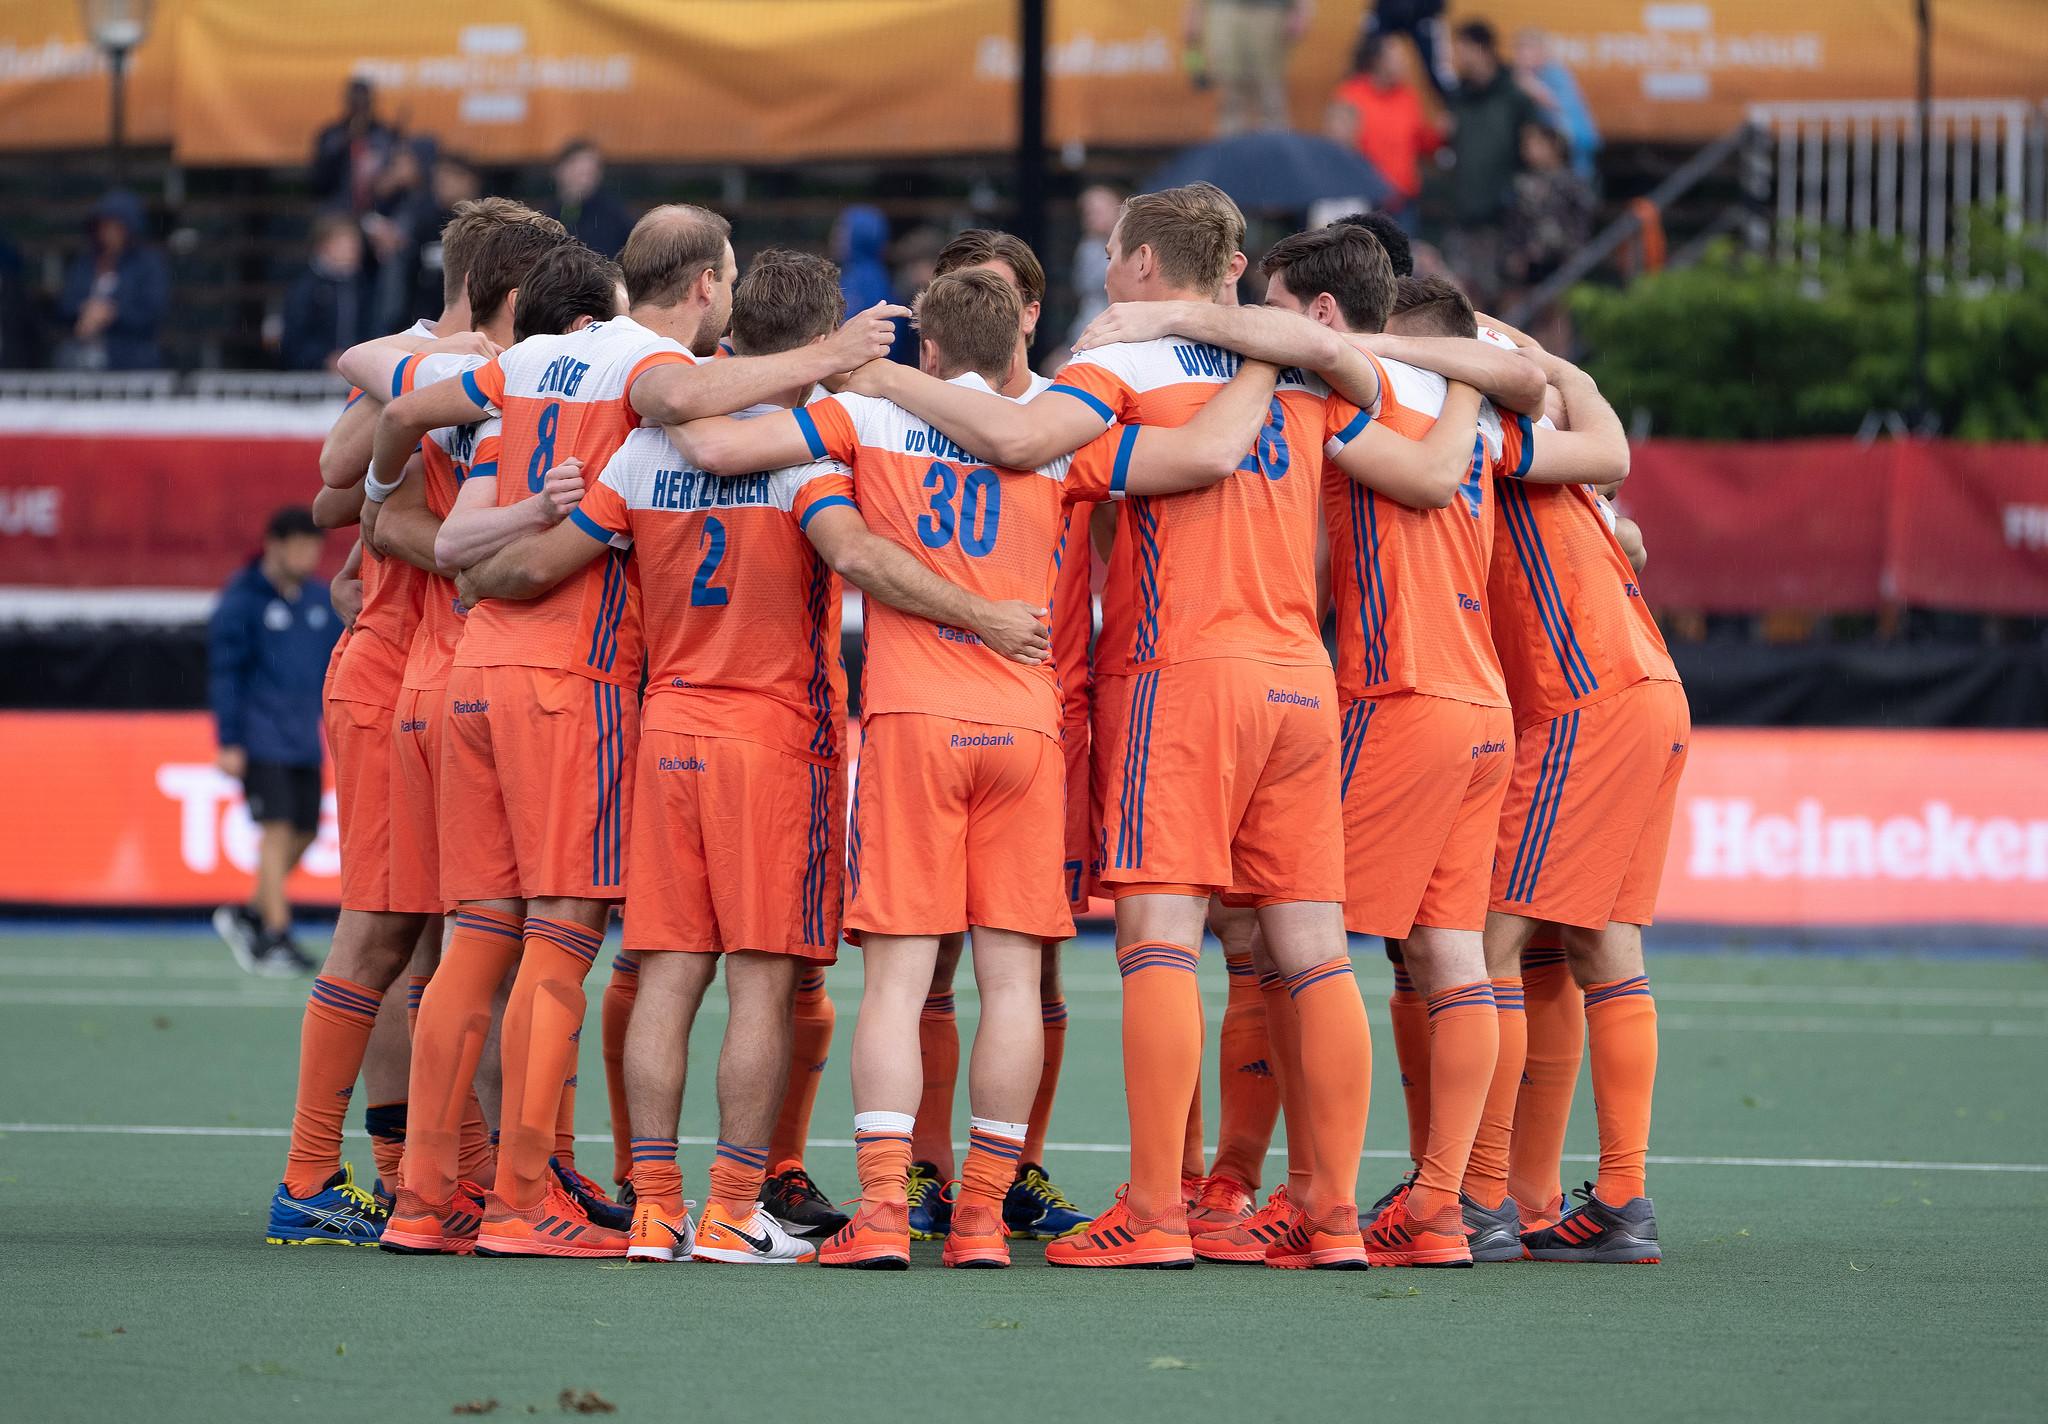 Preview Pro League (H): Laatste testcase voor Grand Final tegen koploper Australië